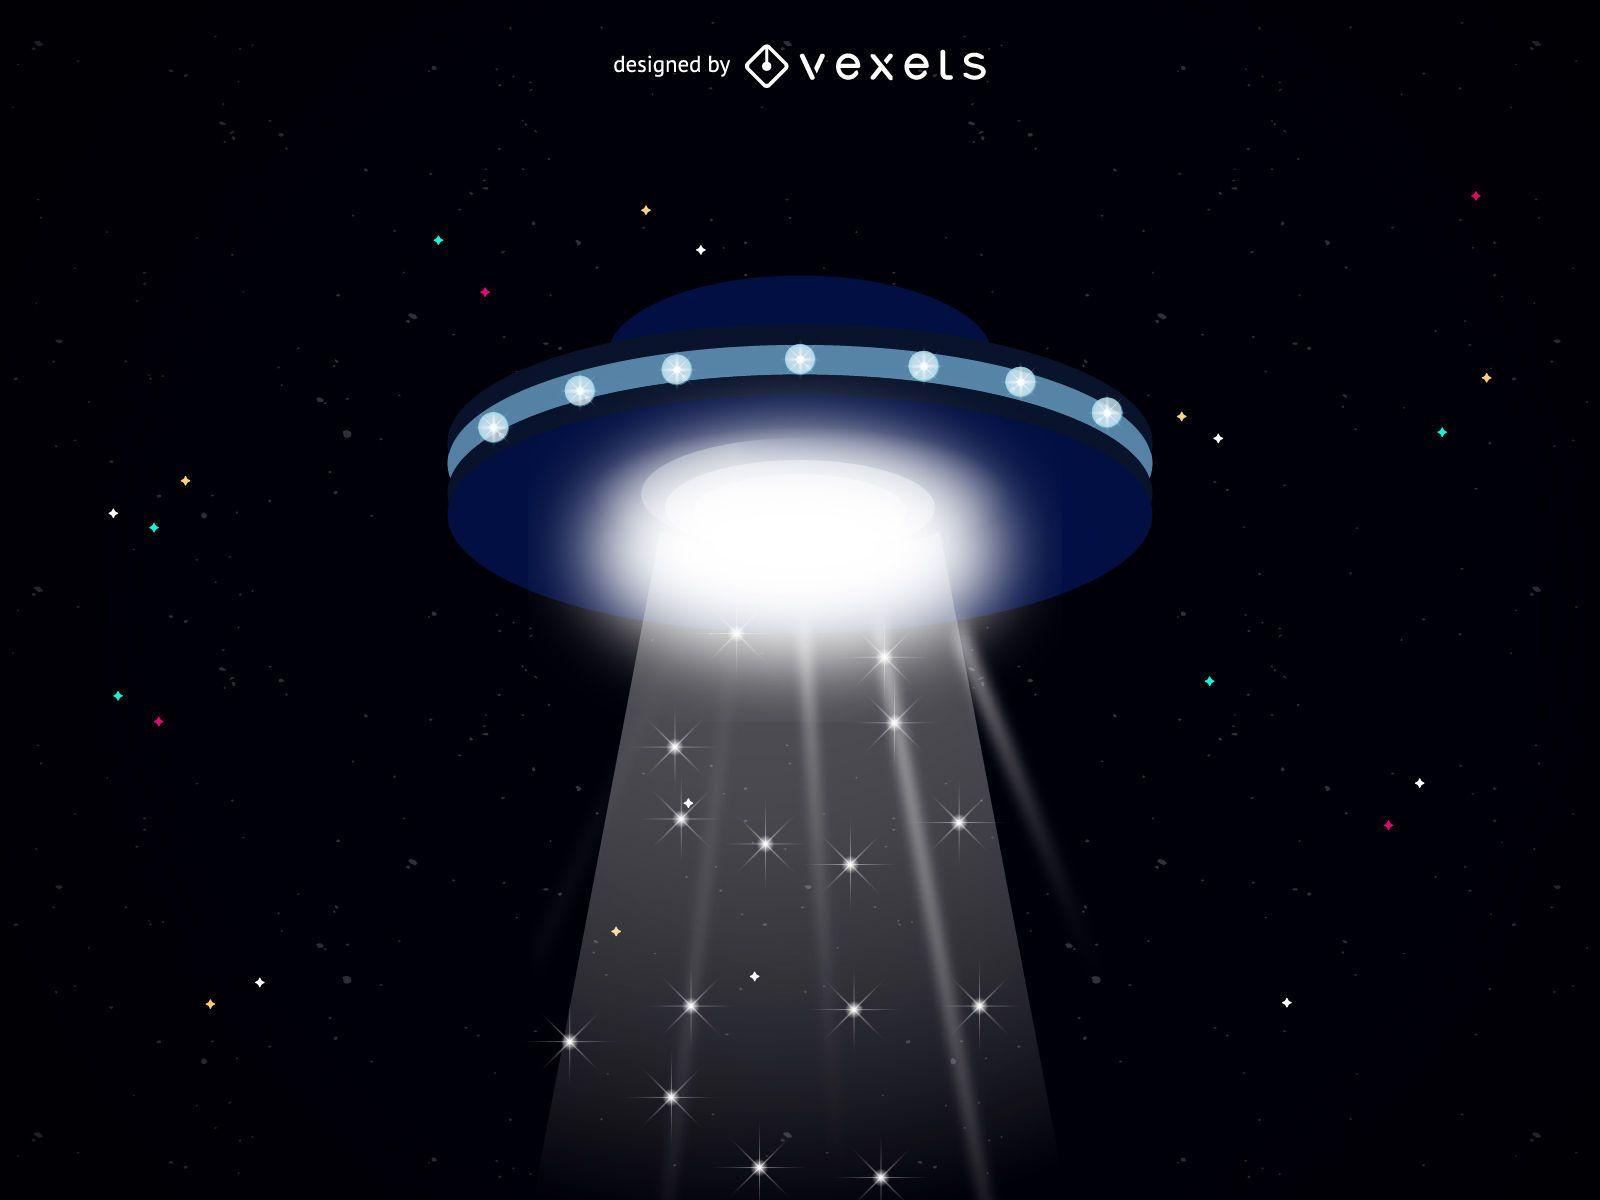 Alien spaceship illustration